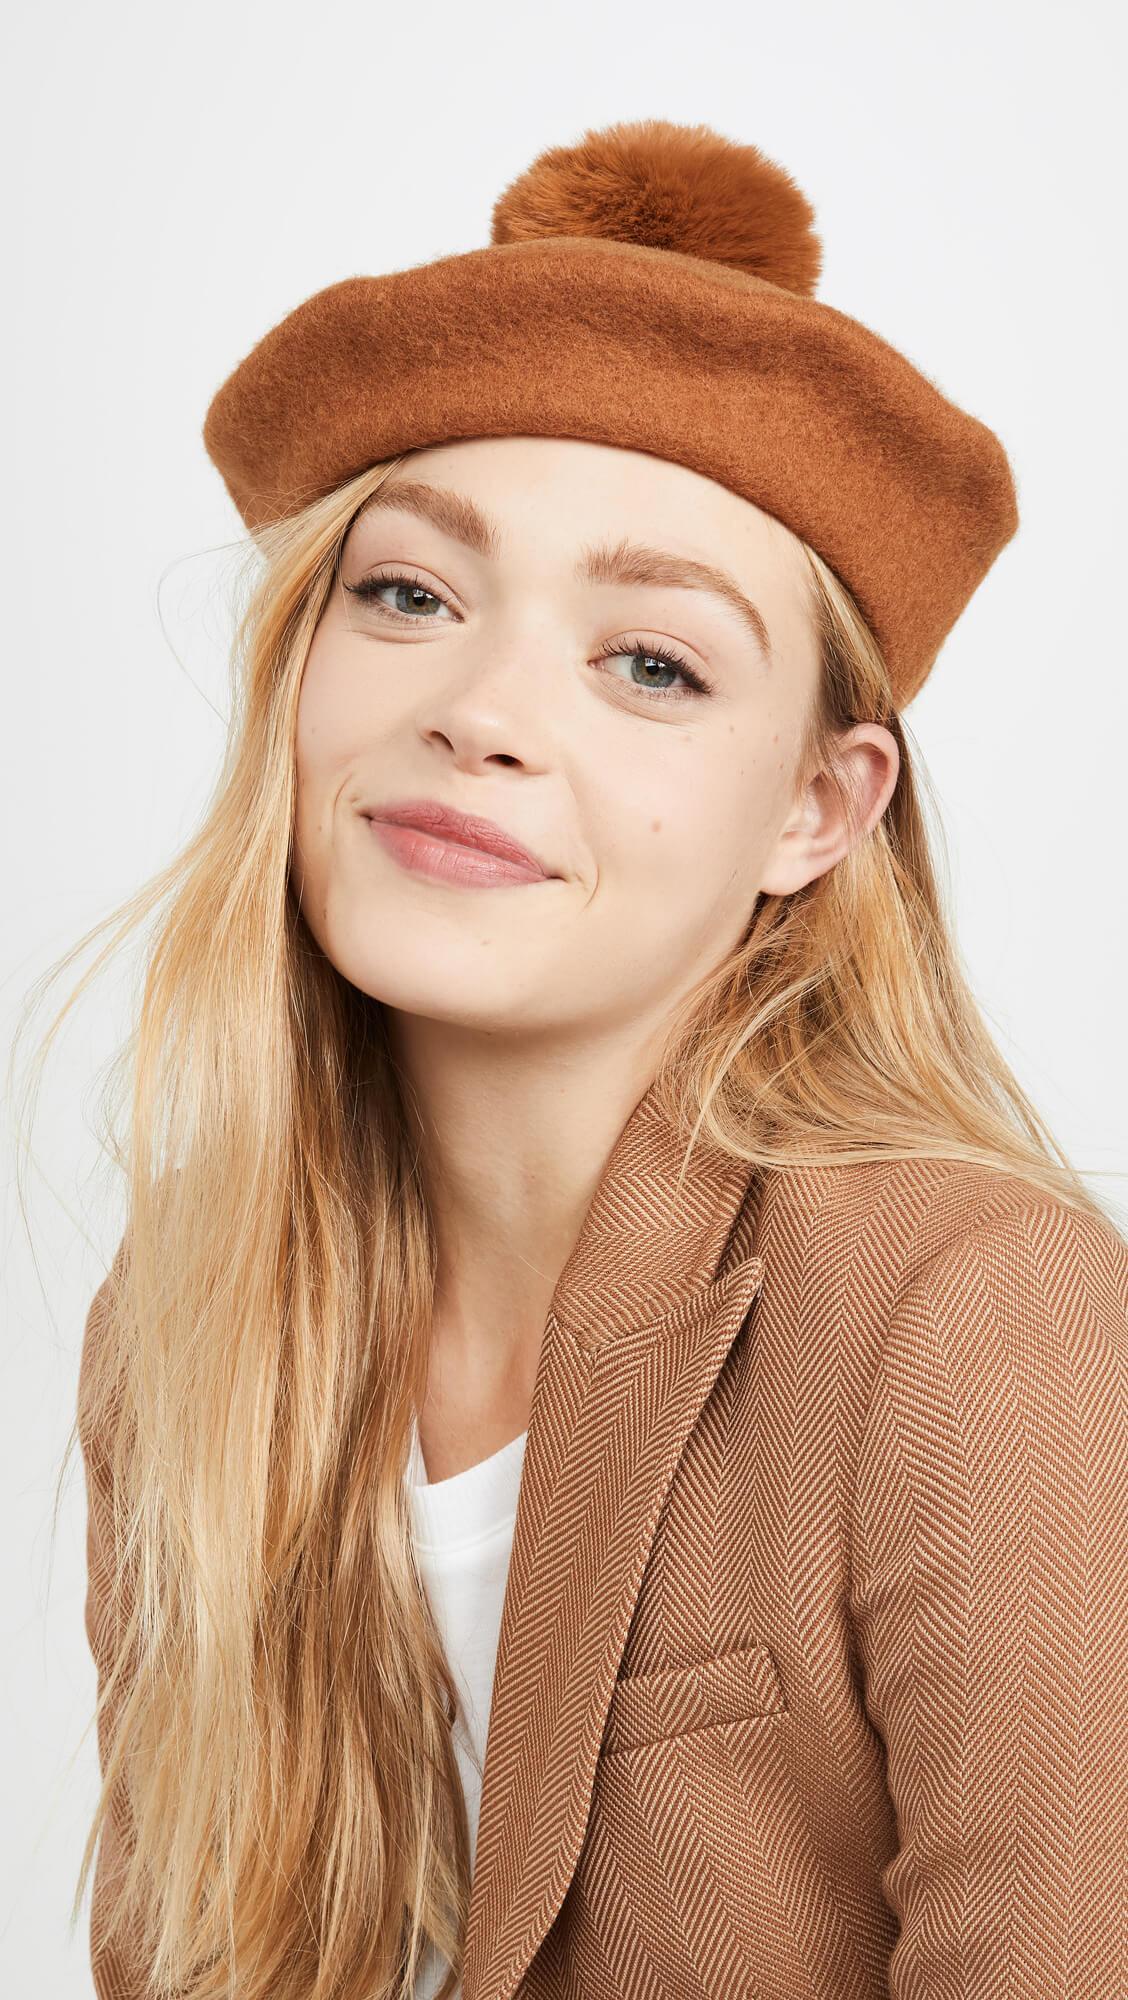 fun fall wardrobe update a beret with a pom pom